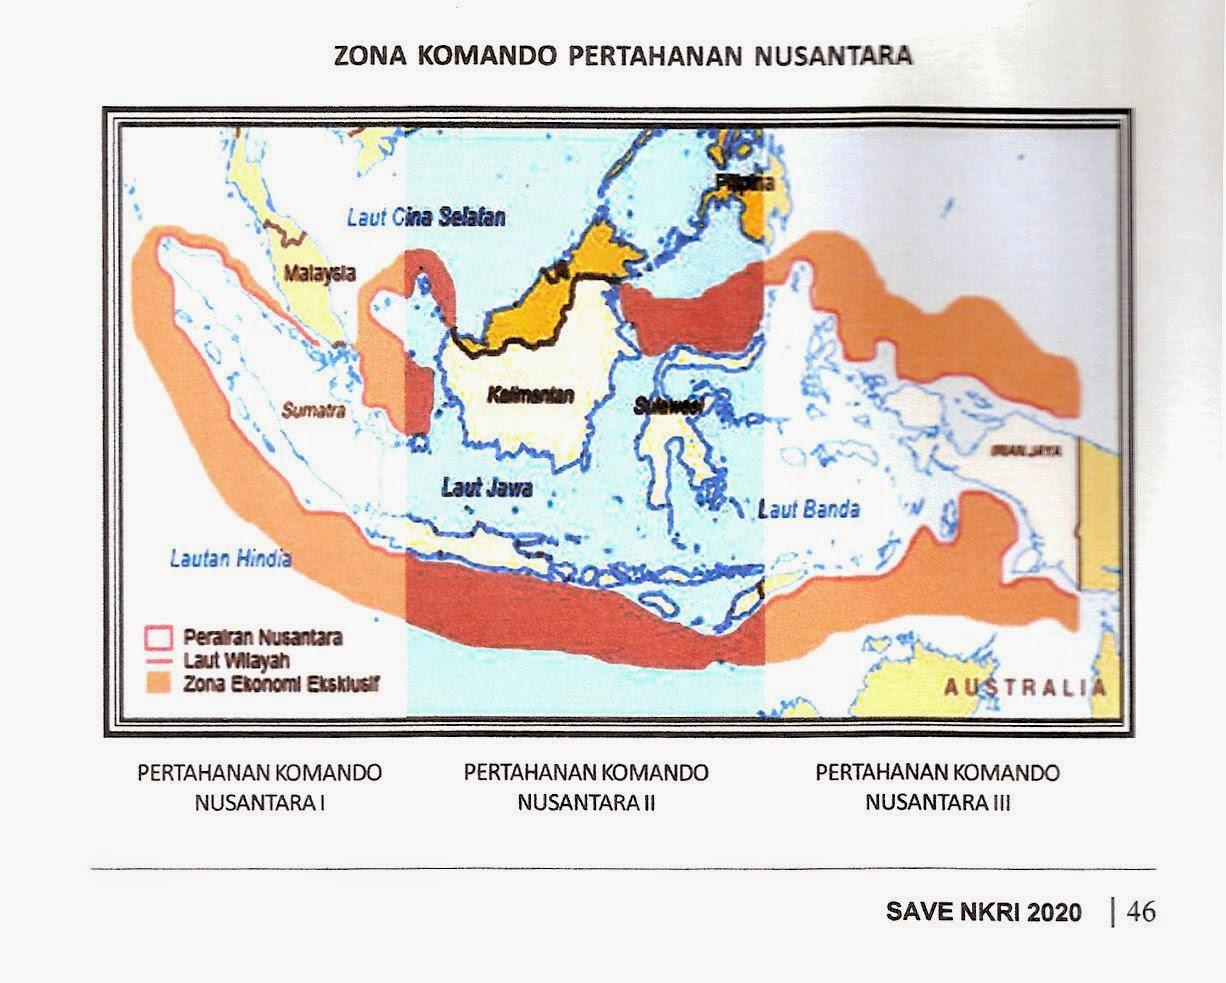 zona komando pertahanan nusantara